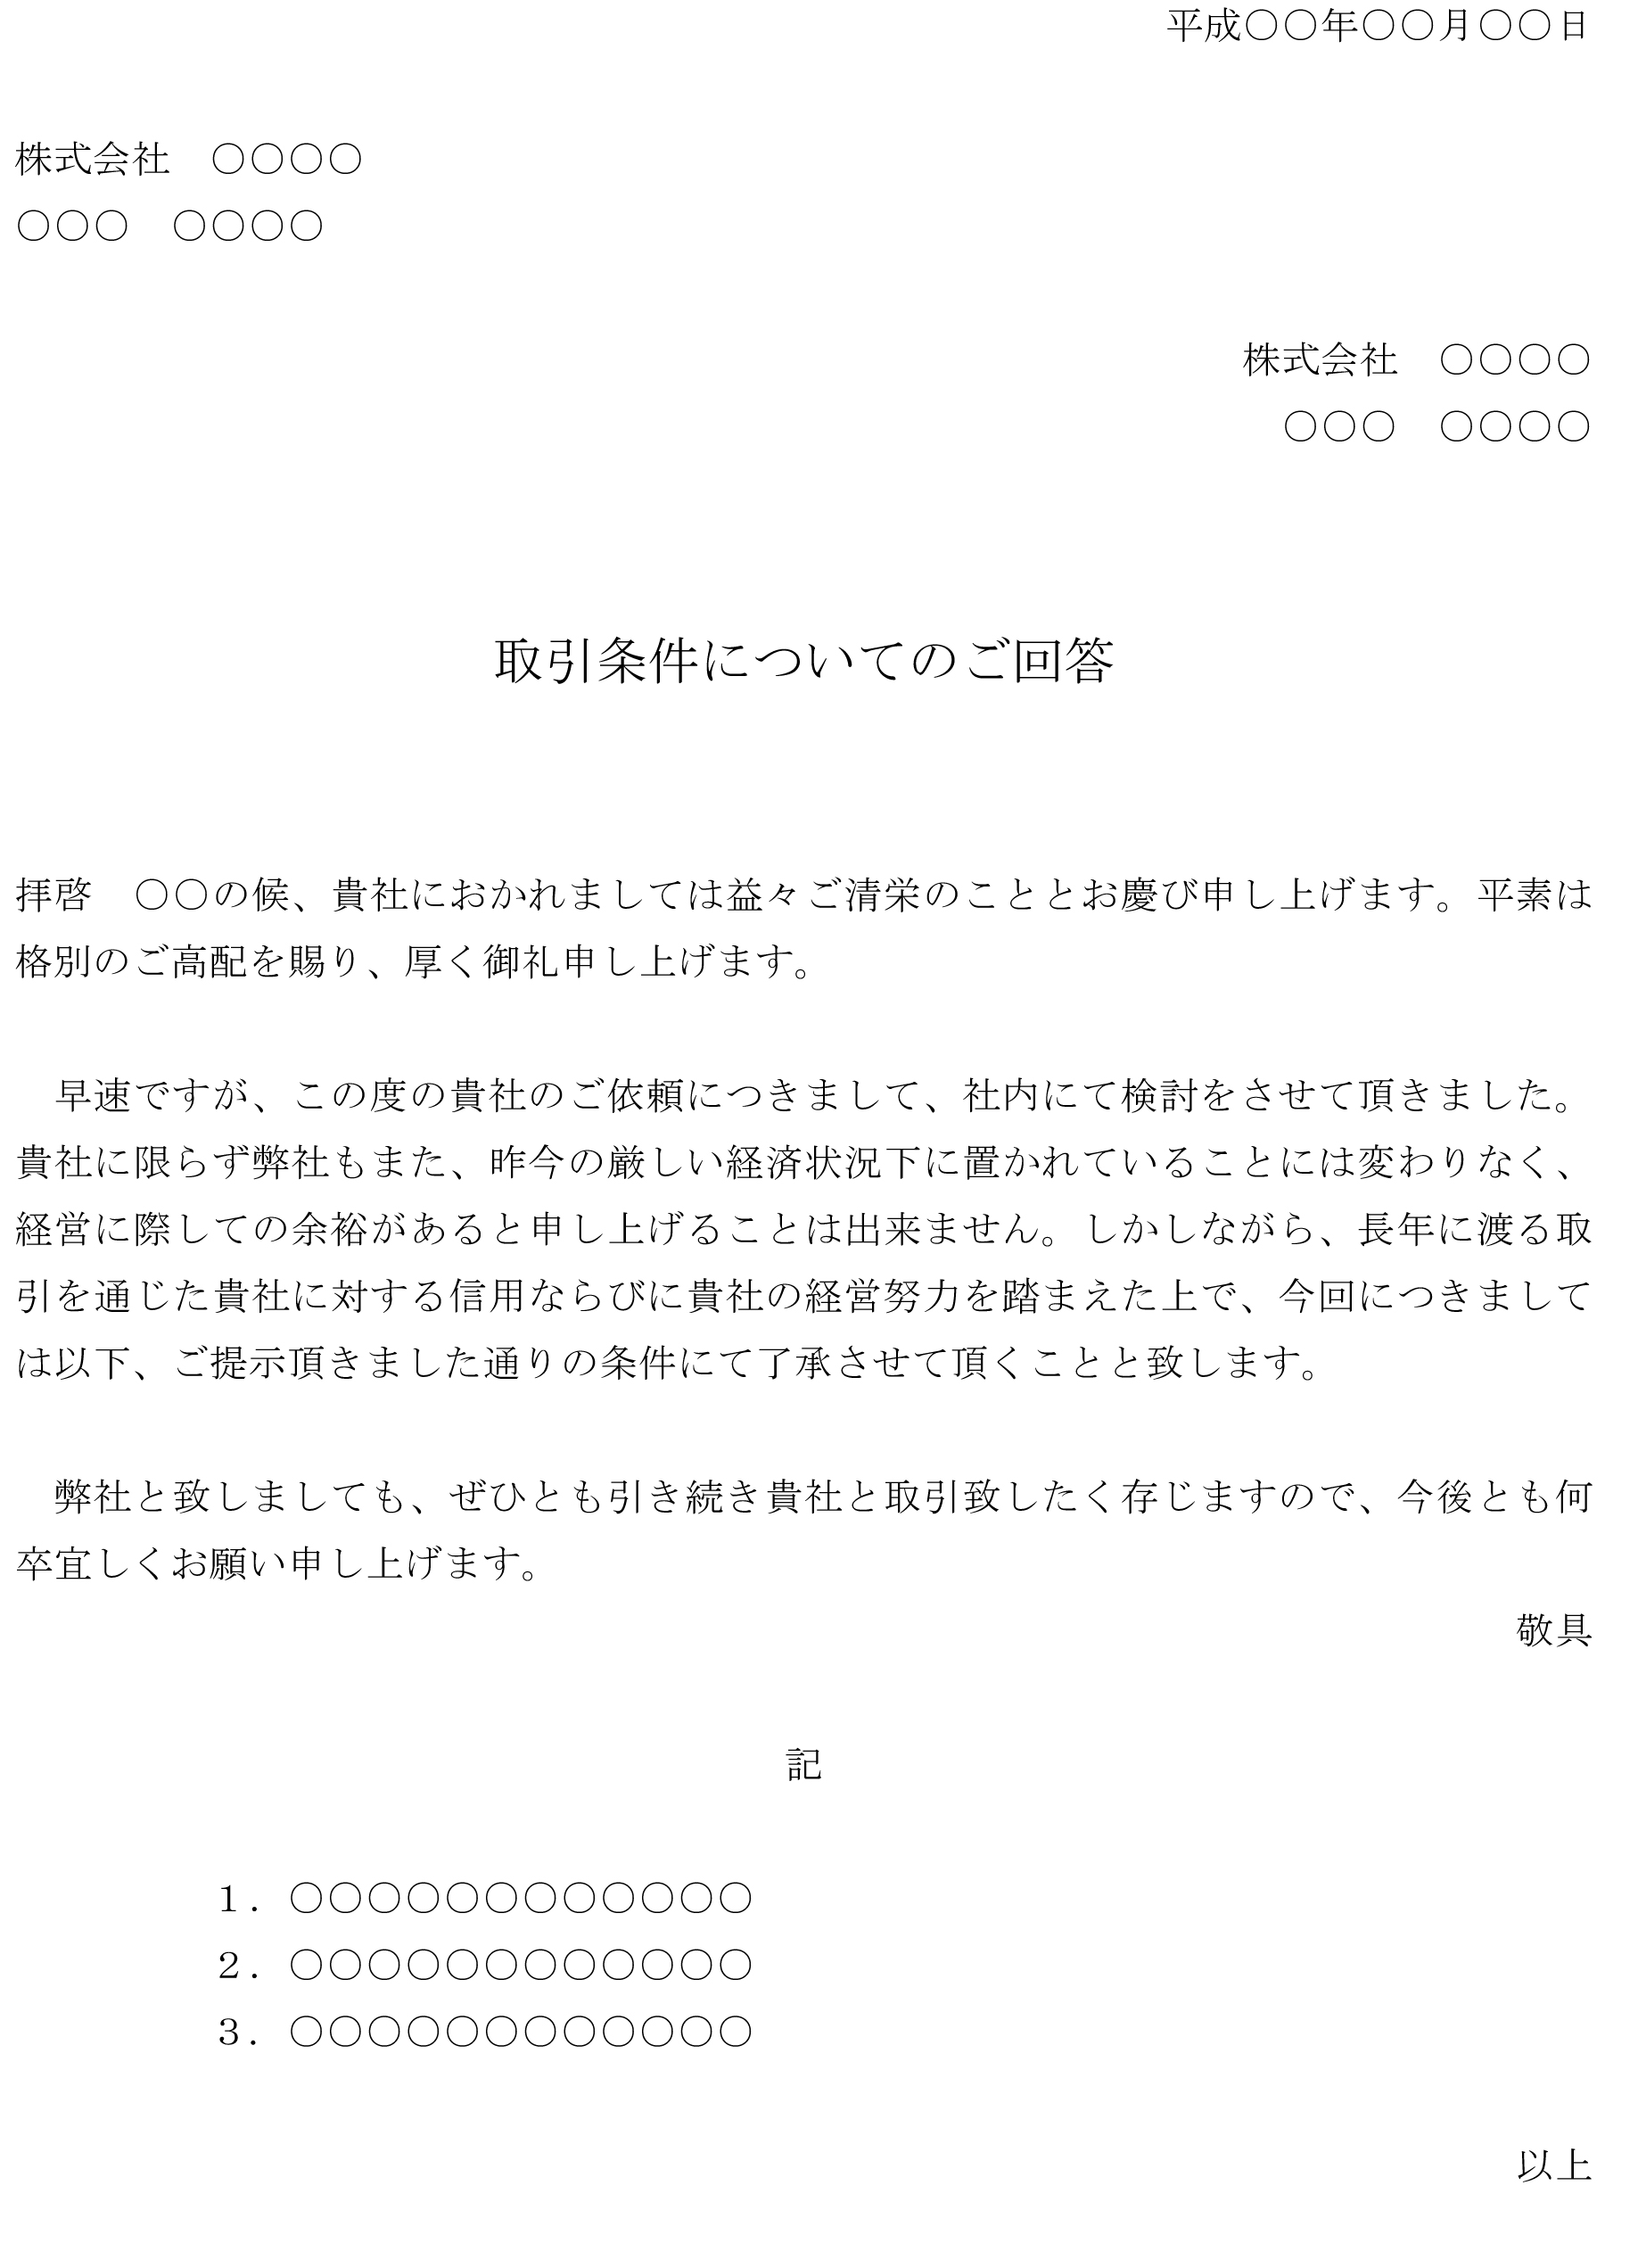 回答書(取引条件の変更依頼を承諾)04